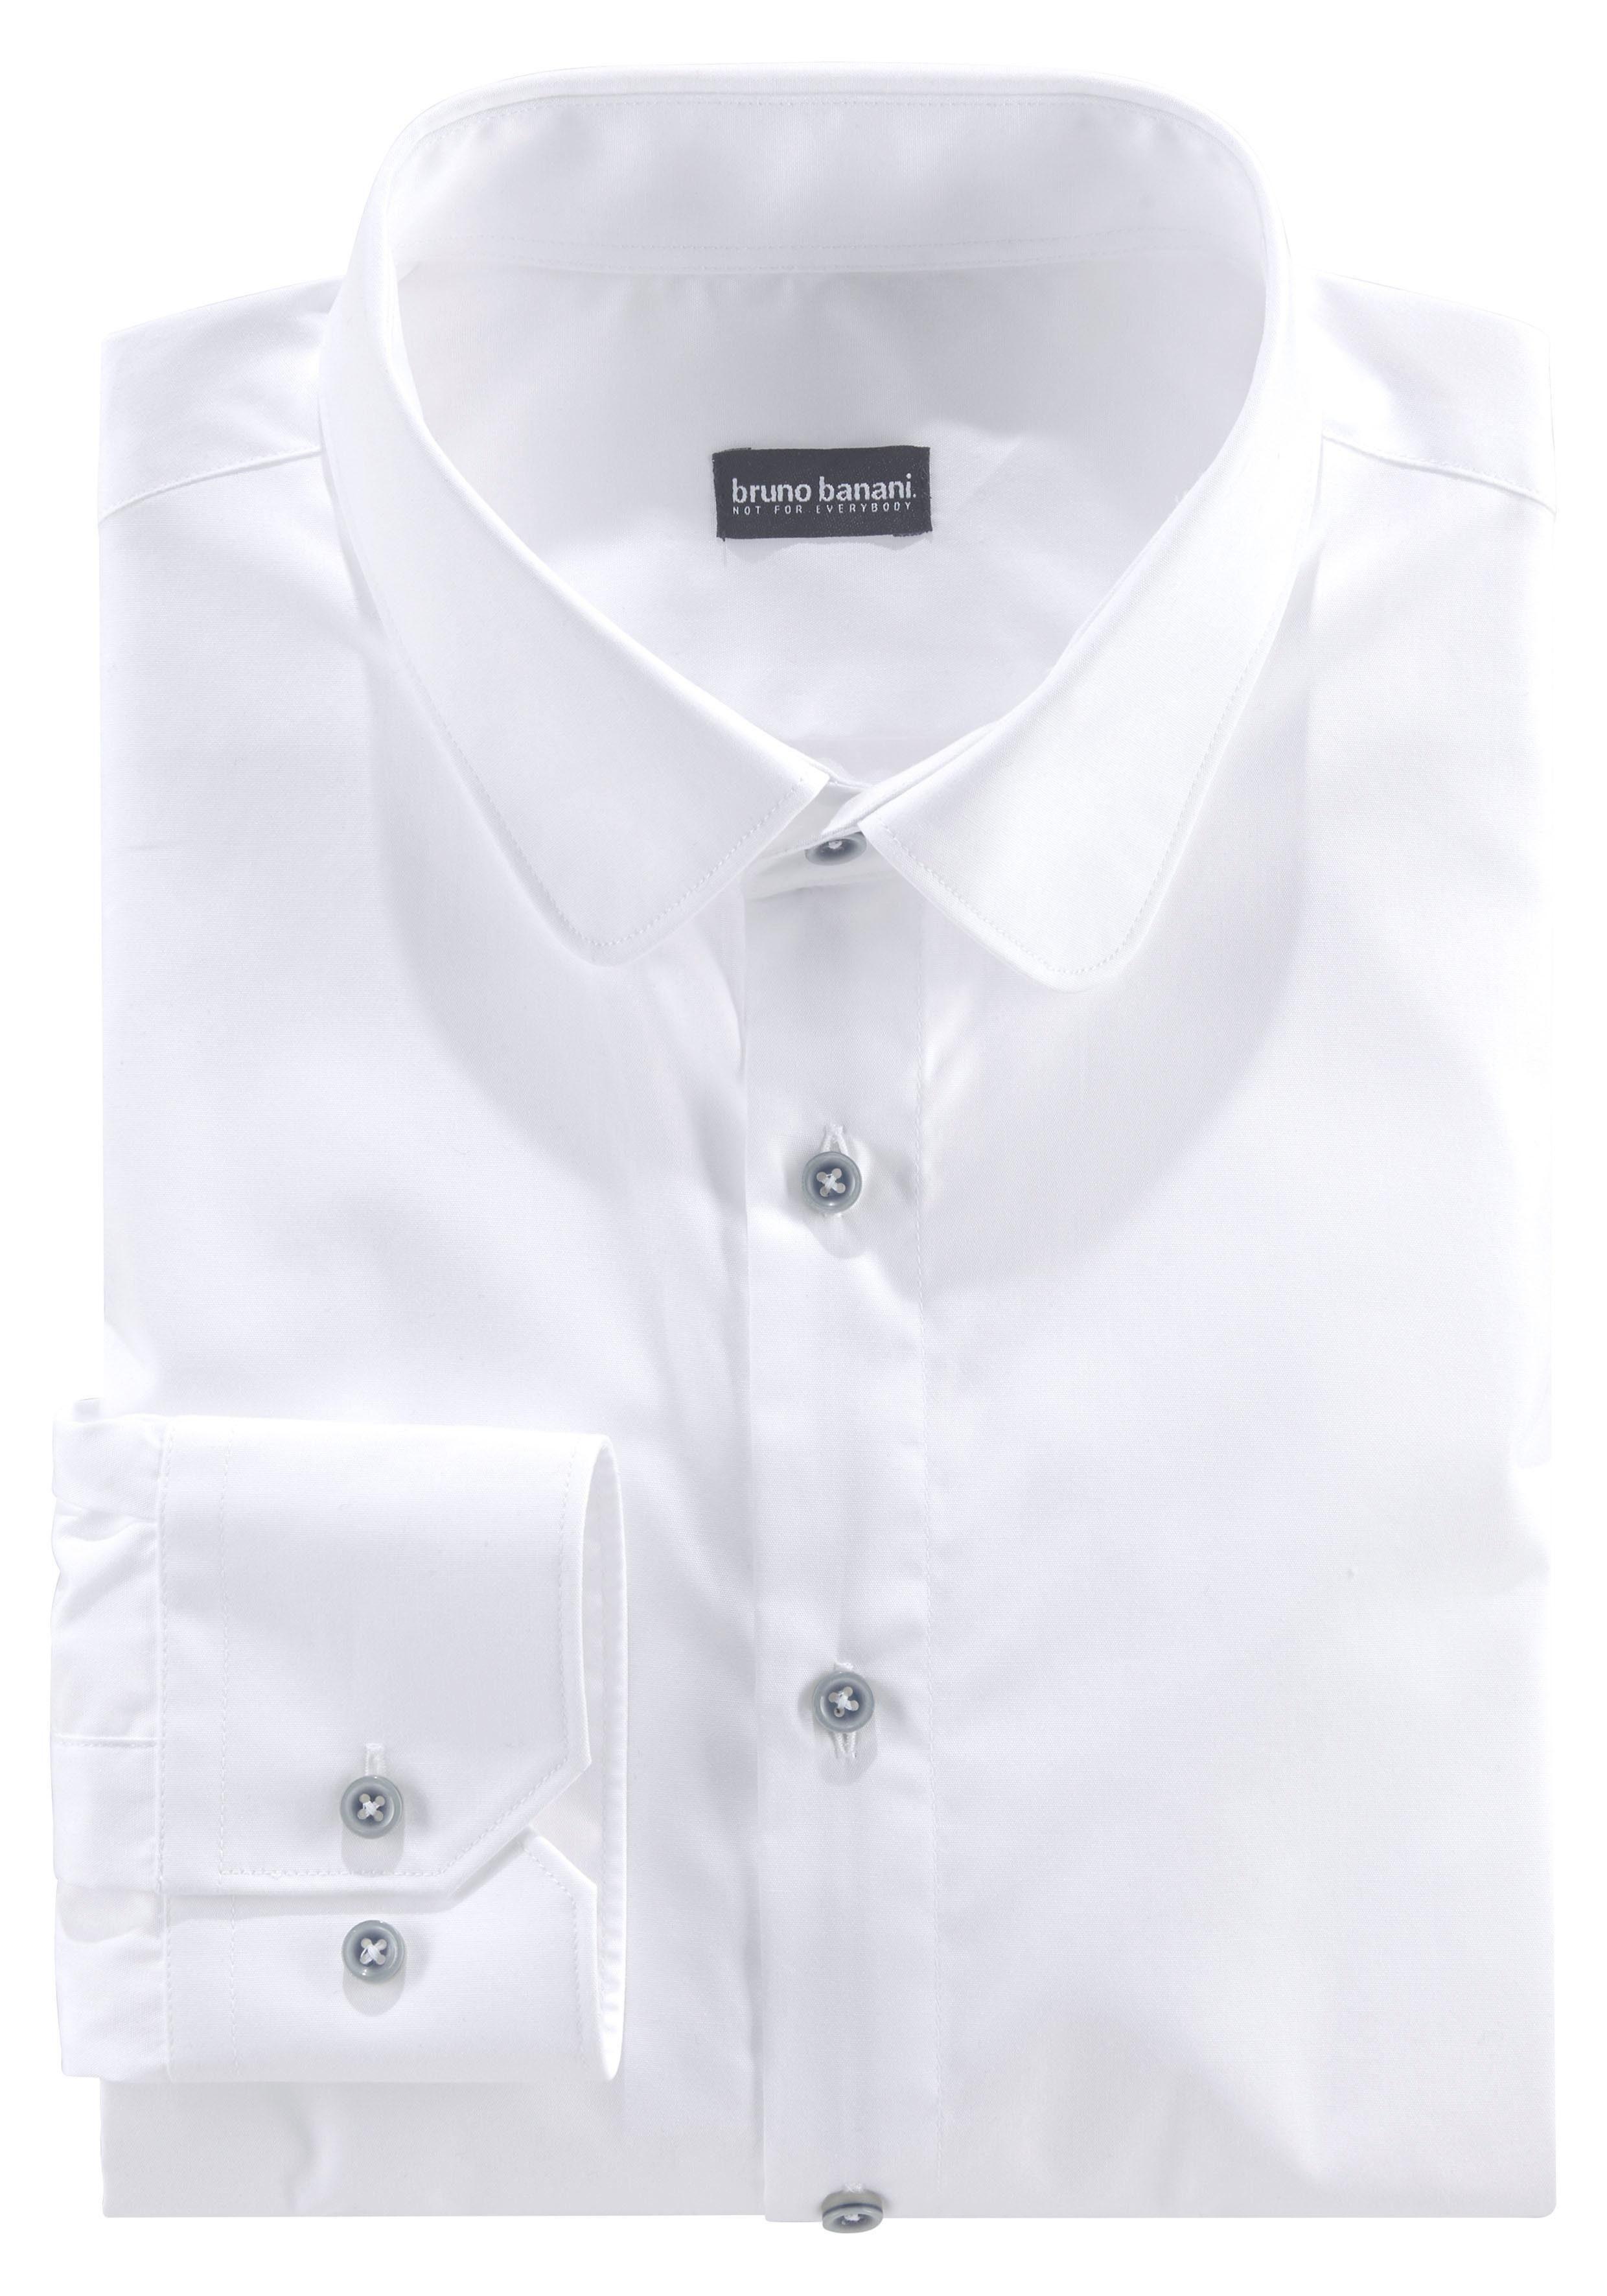 Bruno Banani Businessoverhemd Online Shoppen - Geweldige Prijs